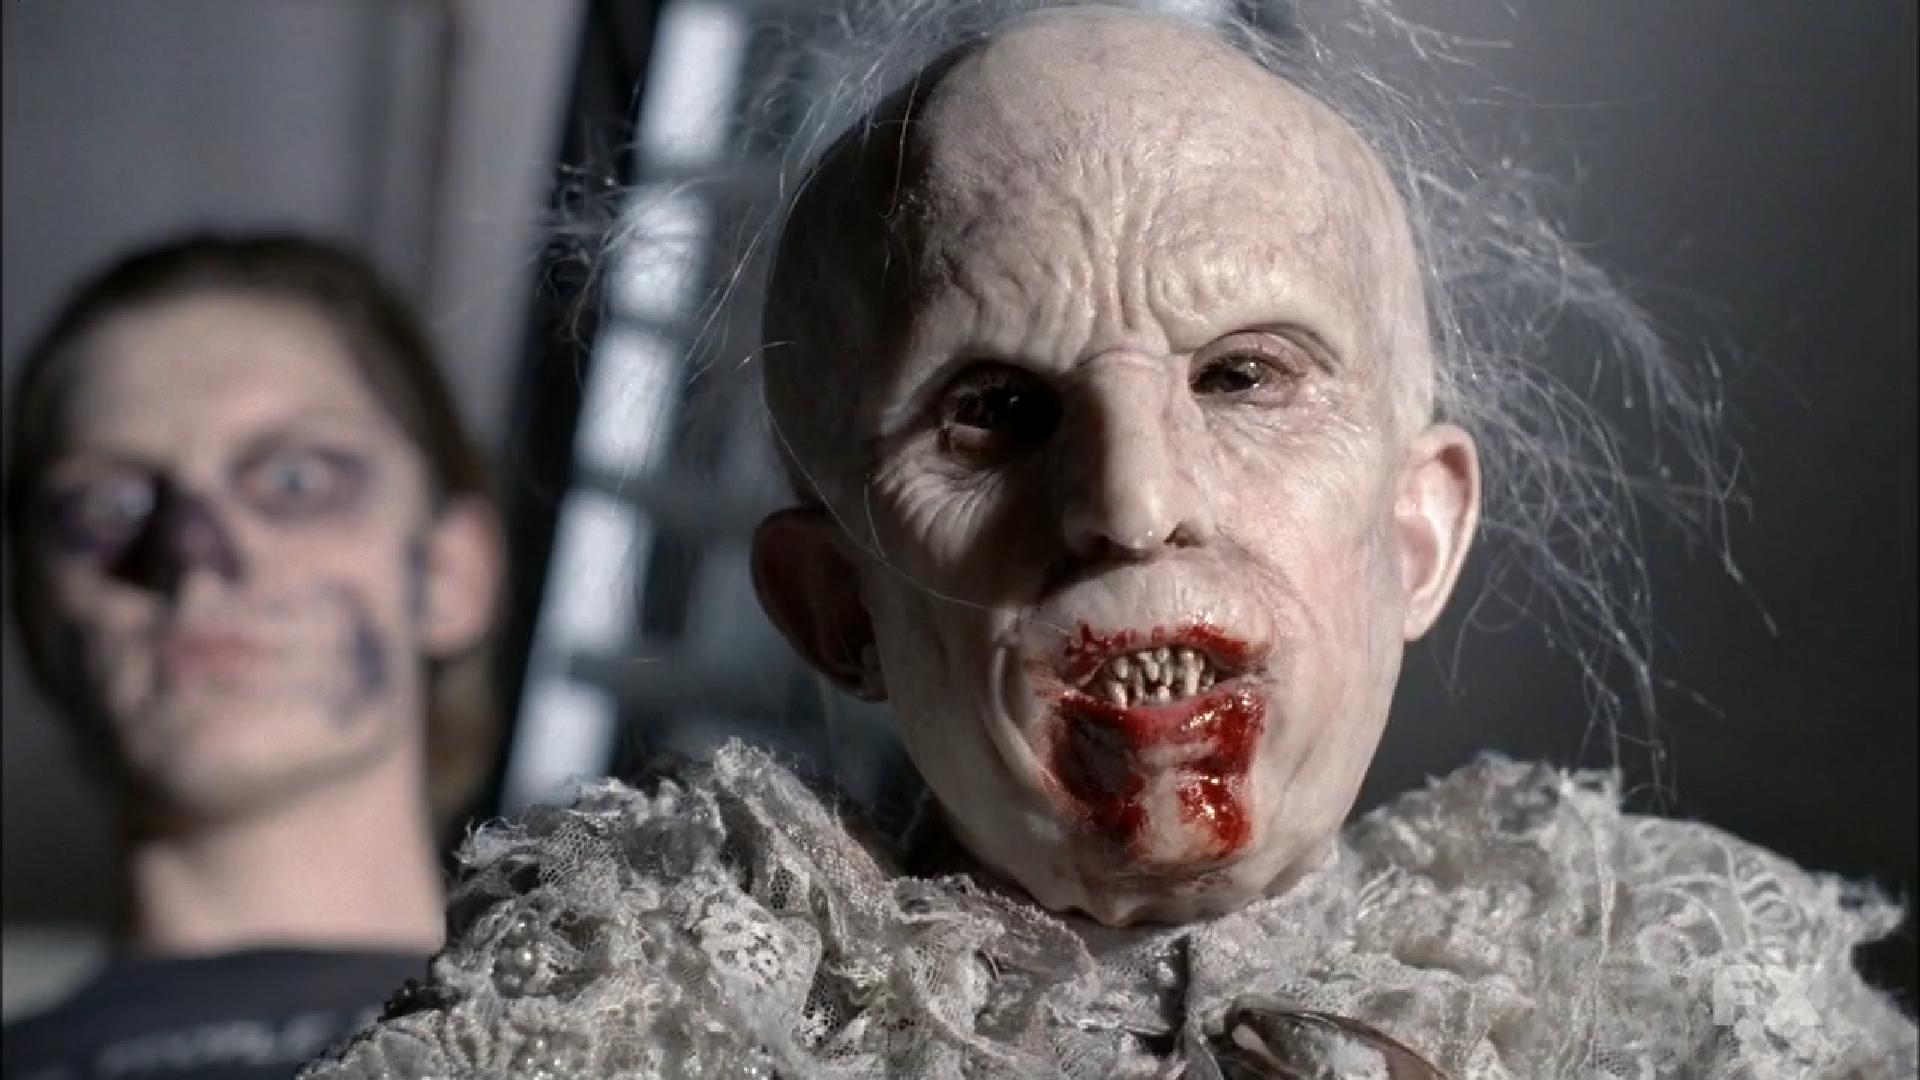 Image - Tateand Infantata.jpg - American Horror Story Wiki Beauregard American Horror Story